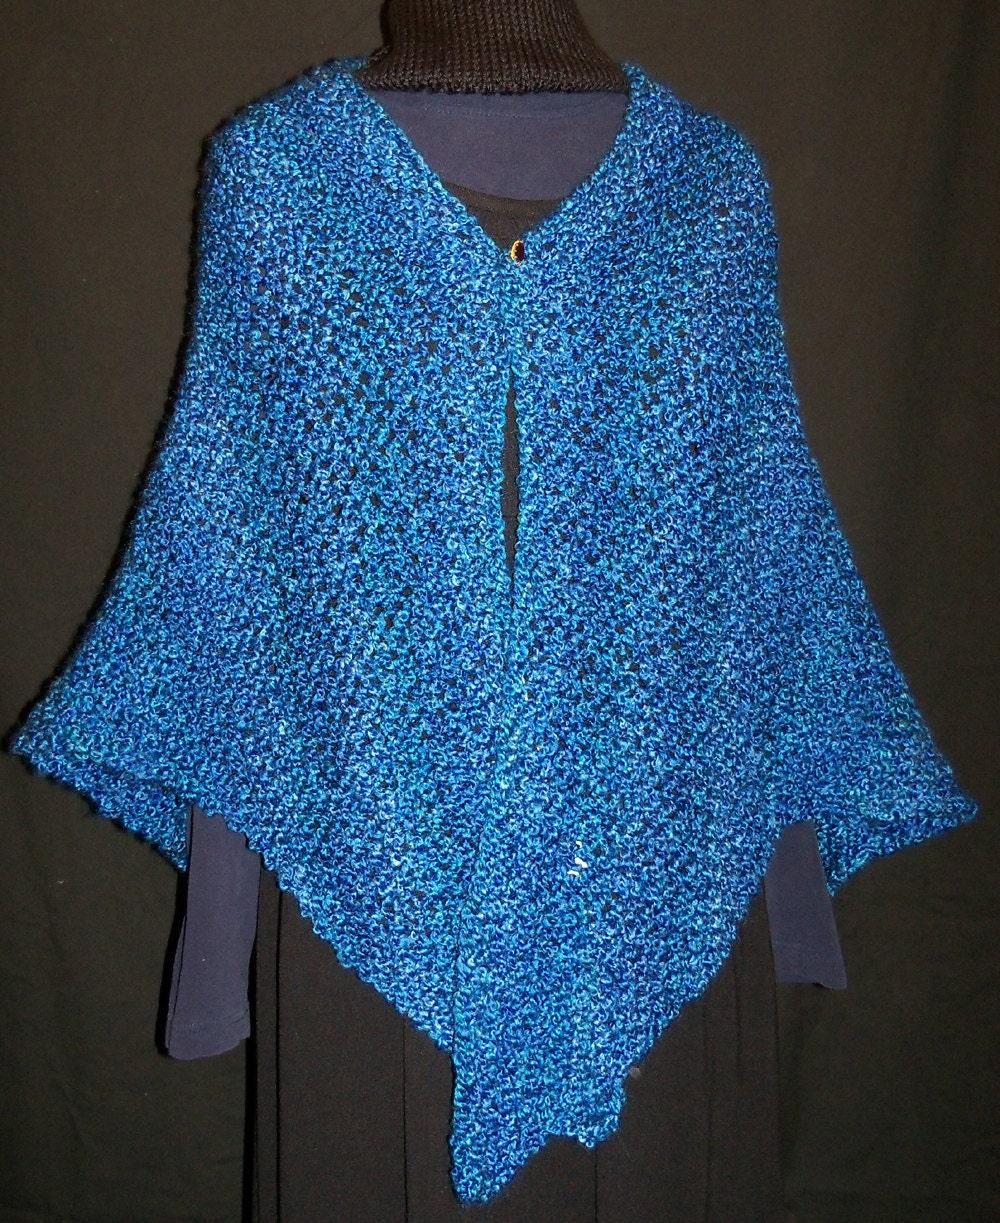 Knitted Triangle Shawl Pattern : KNITTING PATTERN Melissas Triangular Shawl PDF instant